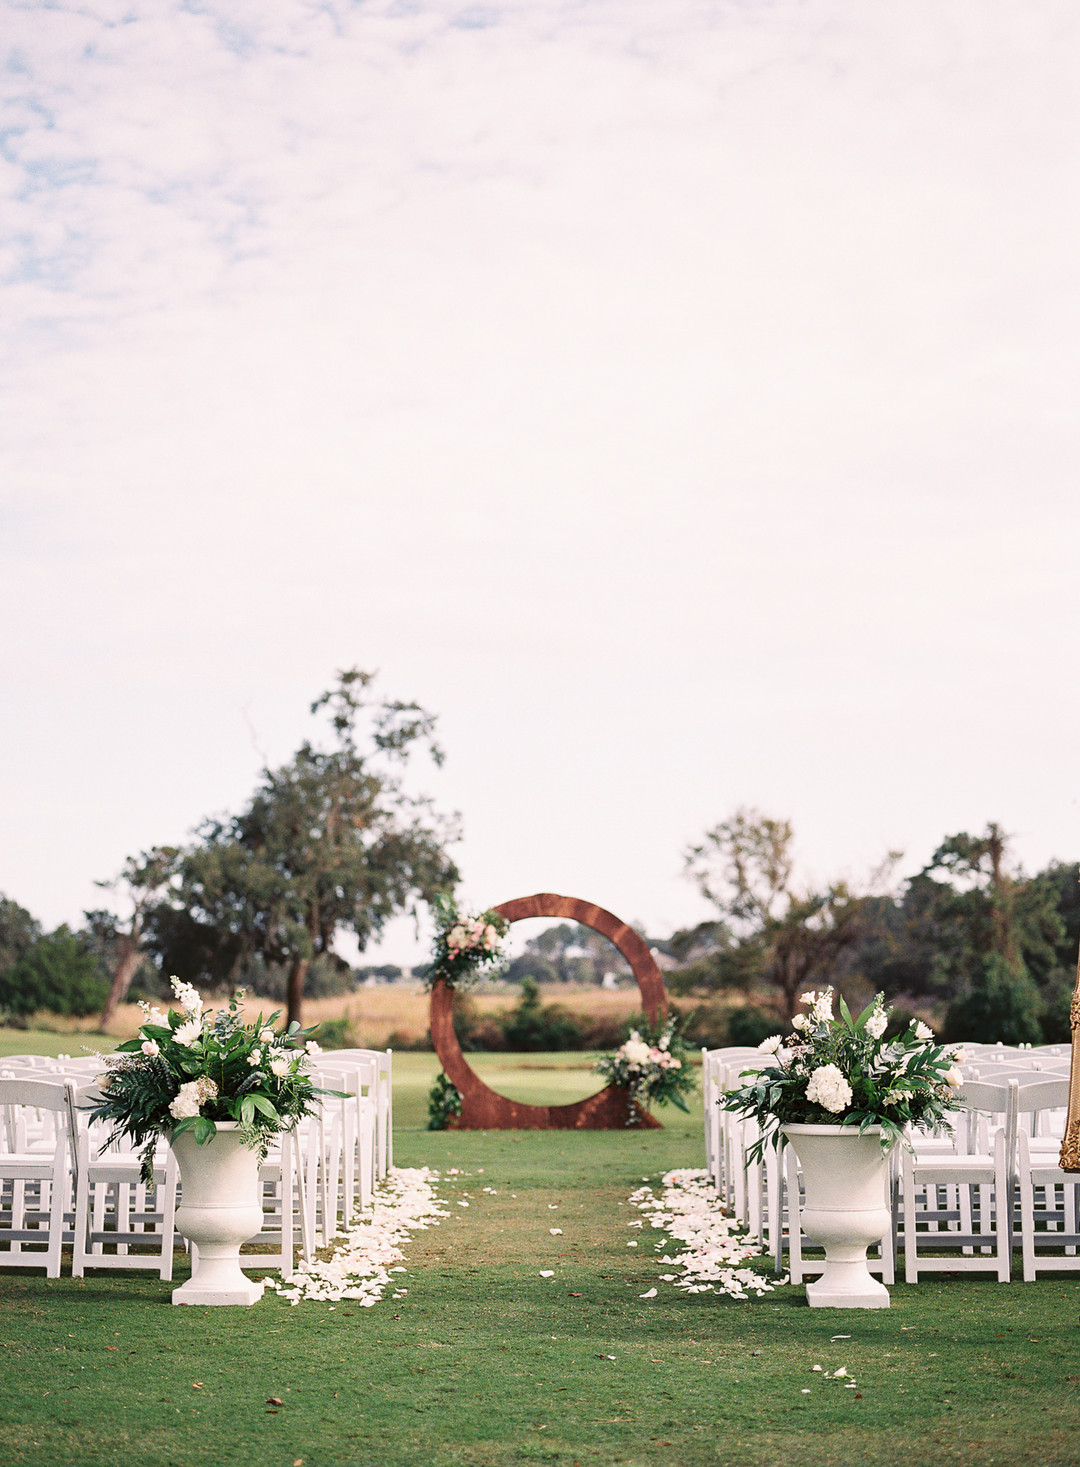 pawleys-plantation-wedding-12.jpg